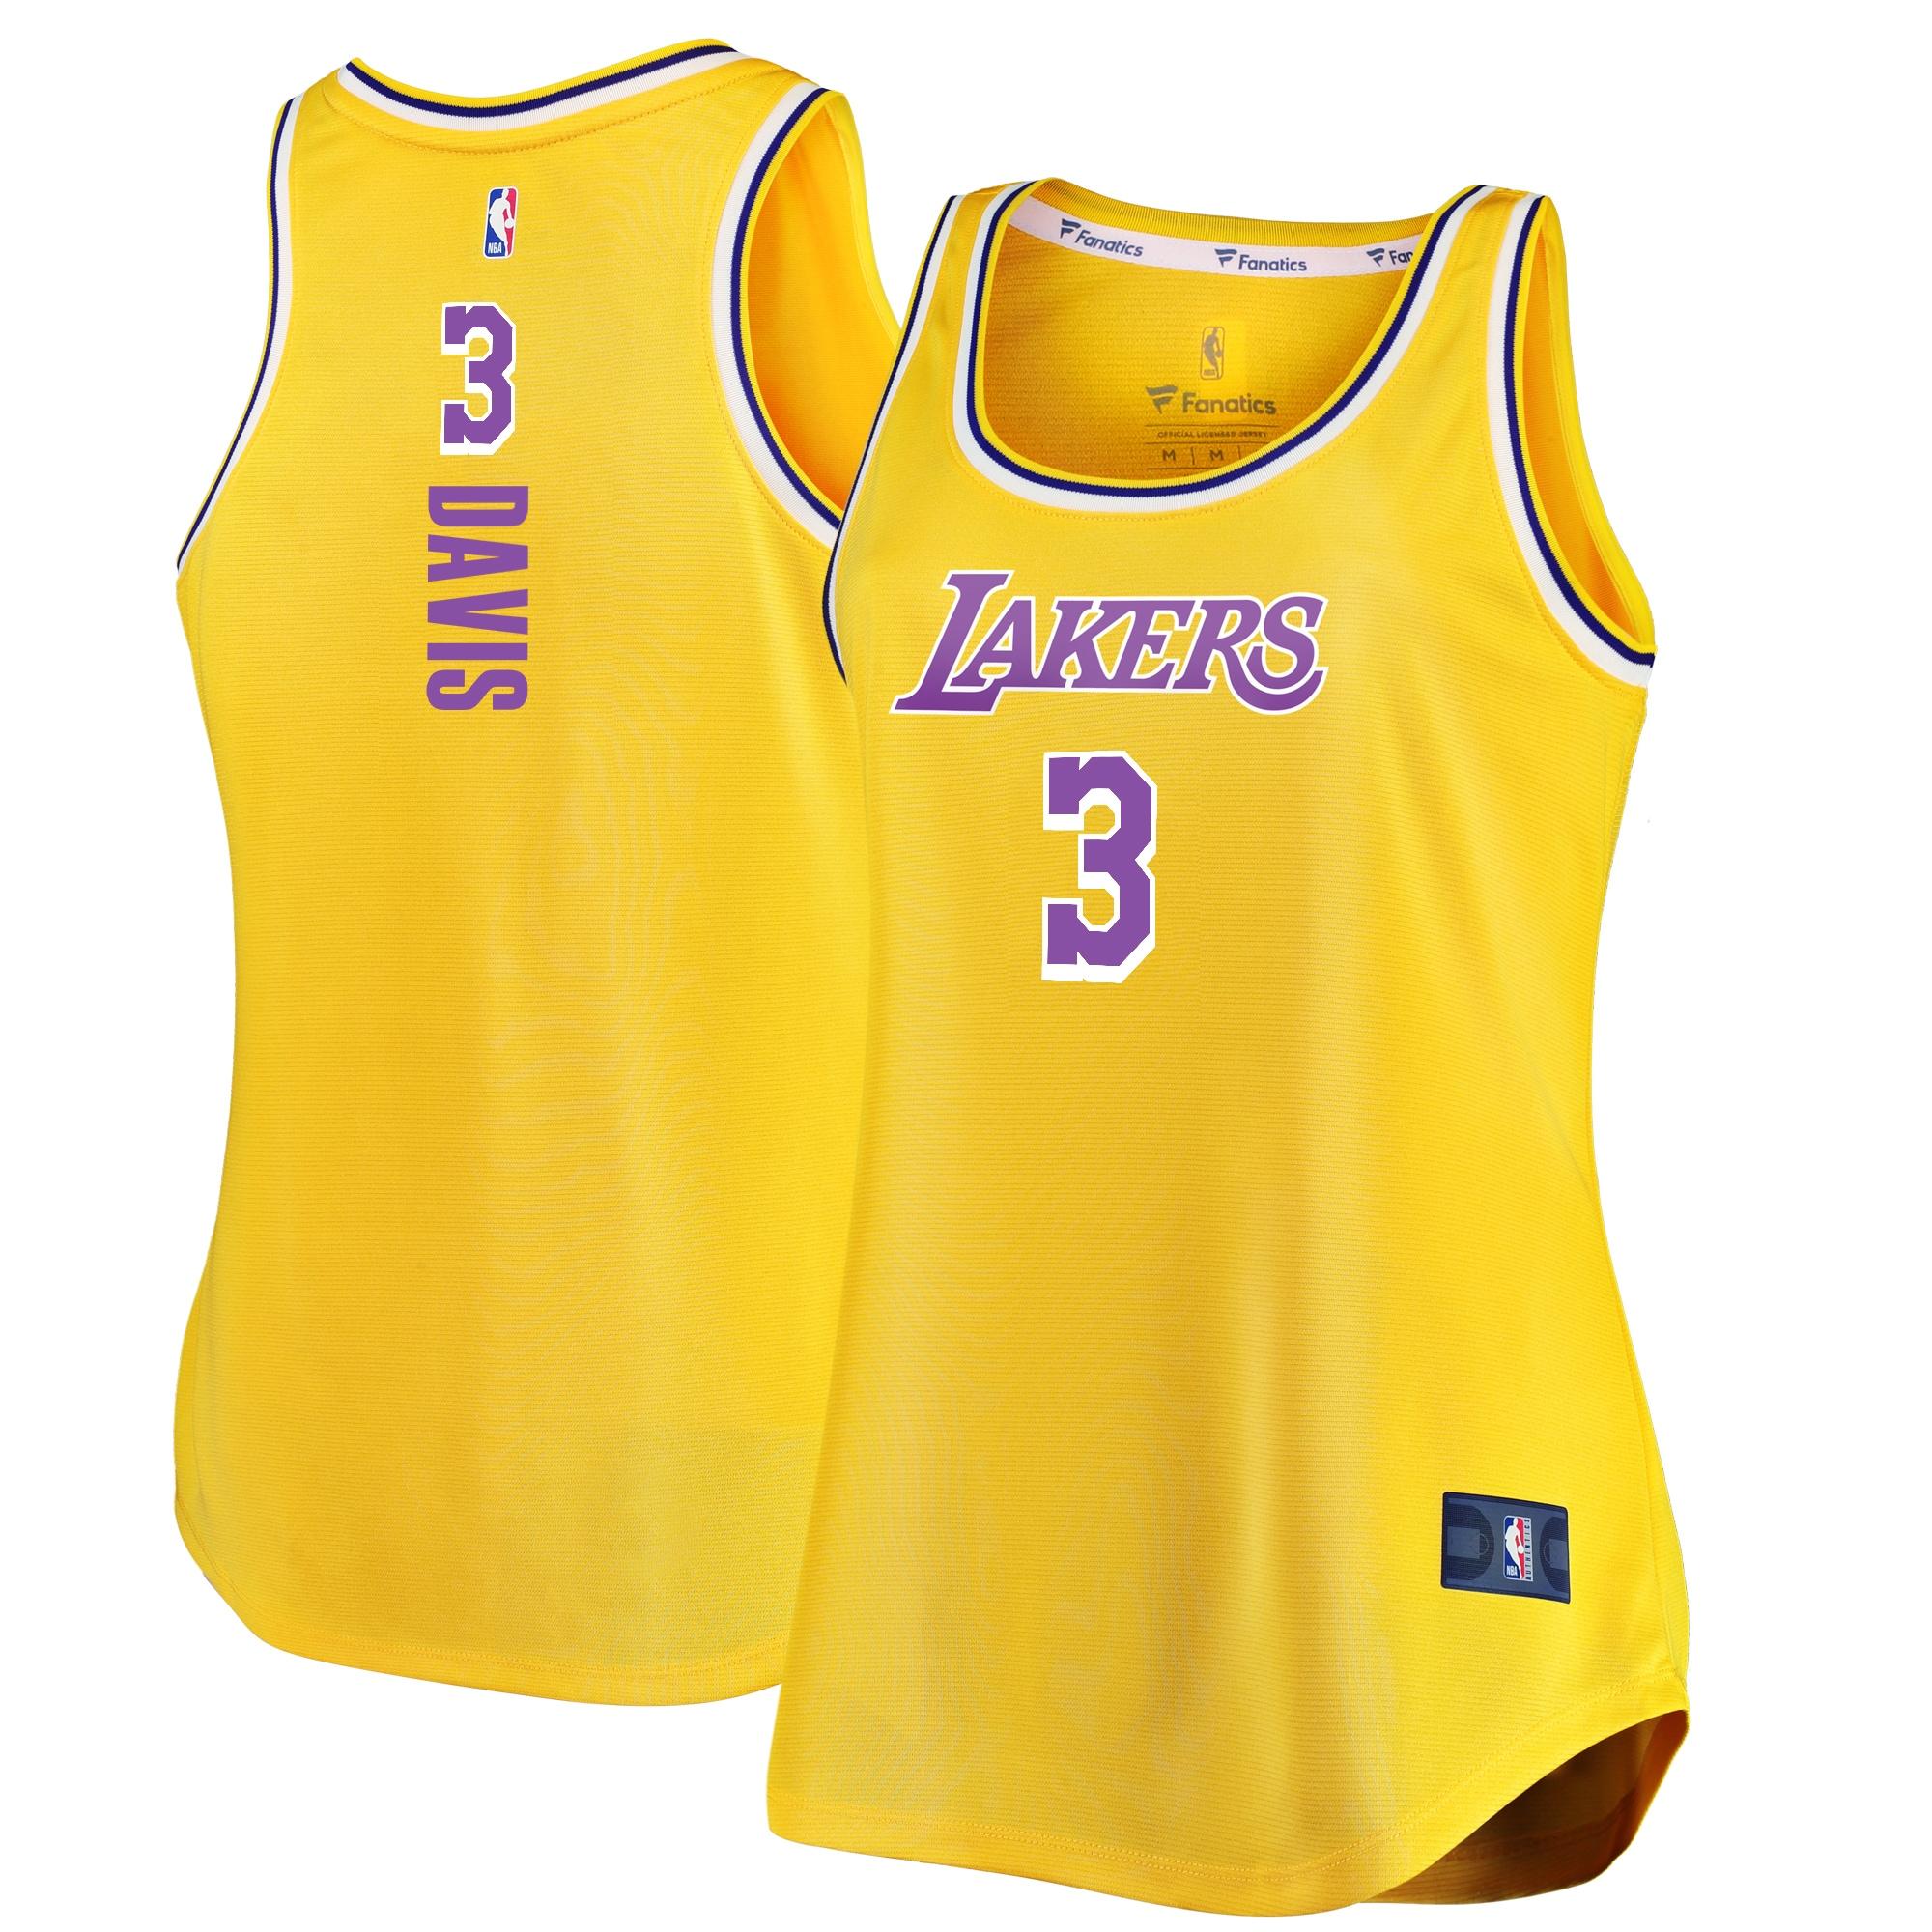 Anthony Davis Los Angeles Lakers Fanatics Branded Women's Fast Break Player Movement Jersey Tank Top - Gold